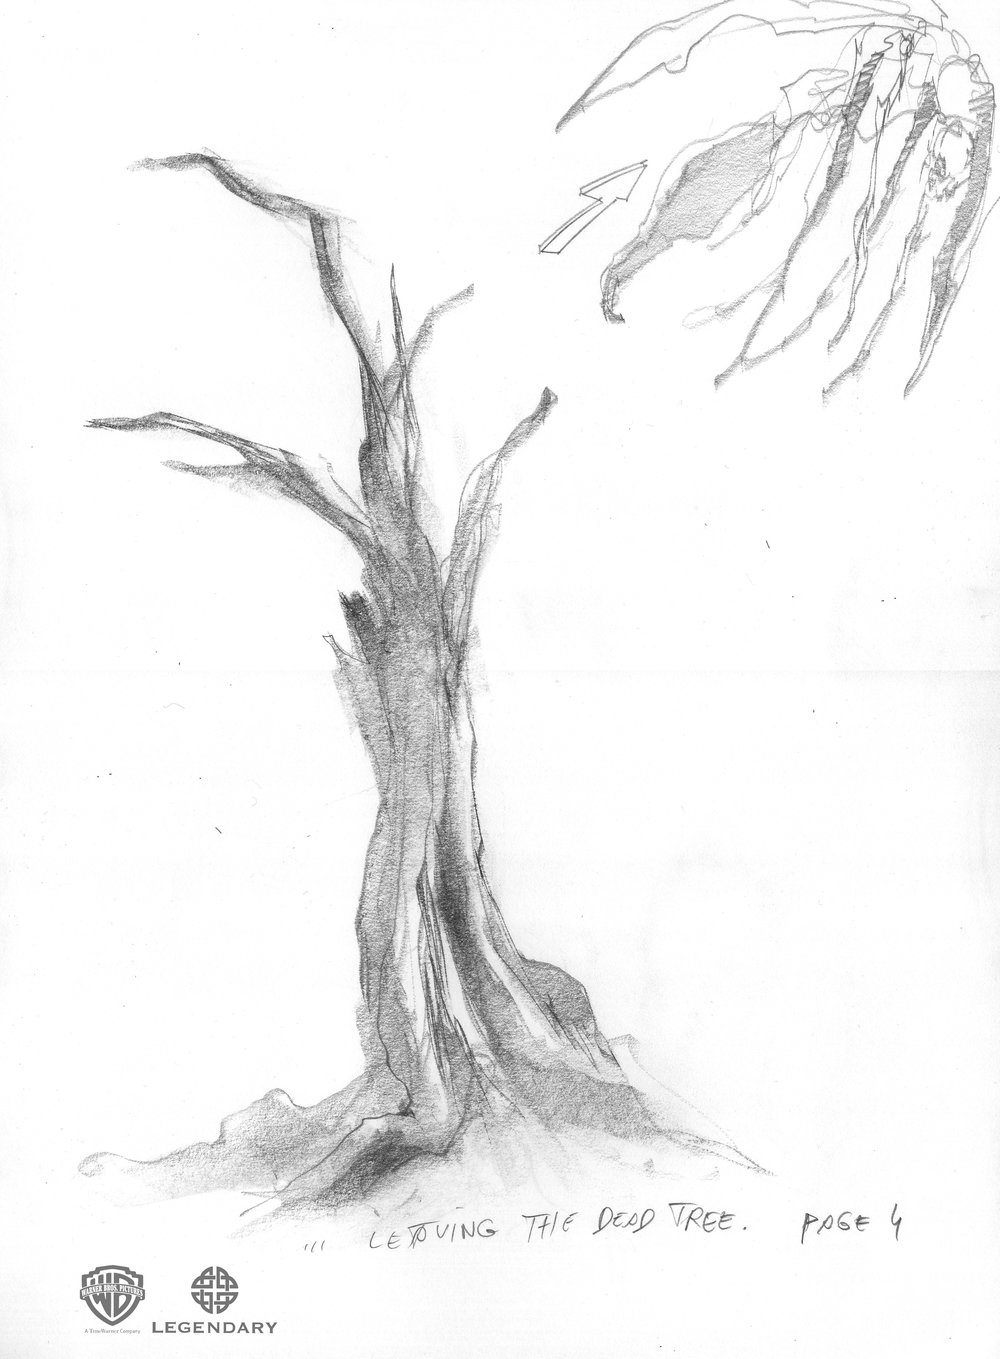 TITAN_TreeOfBirds_SL02.1004.jpg